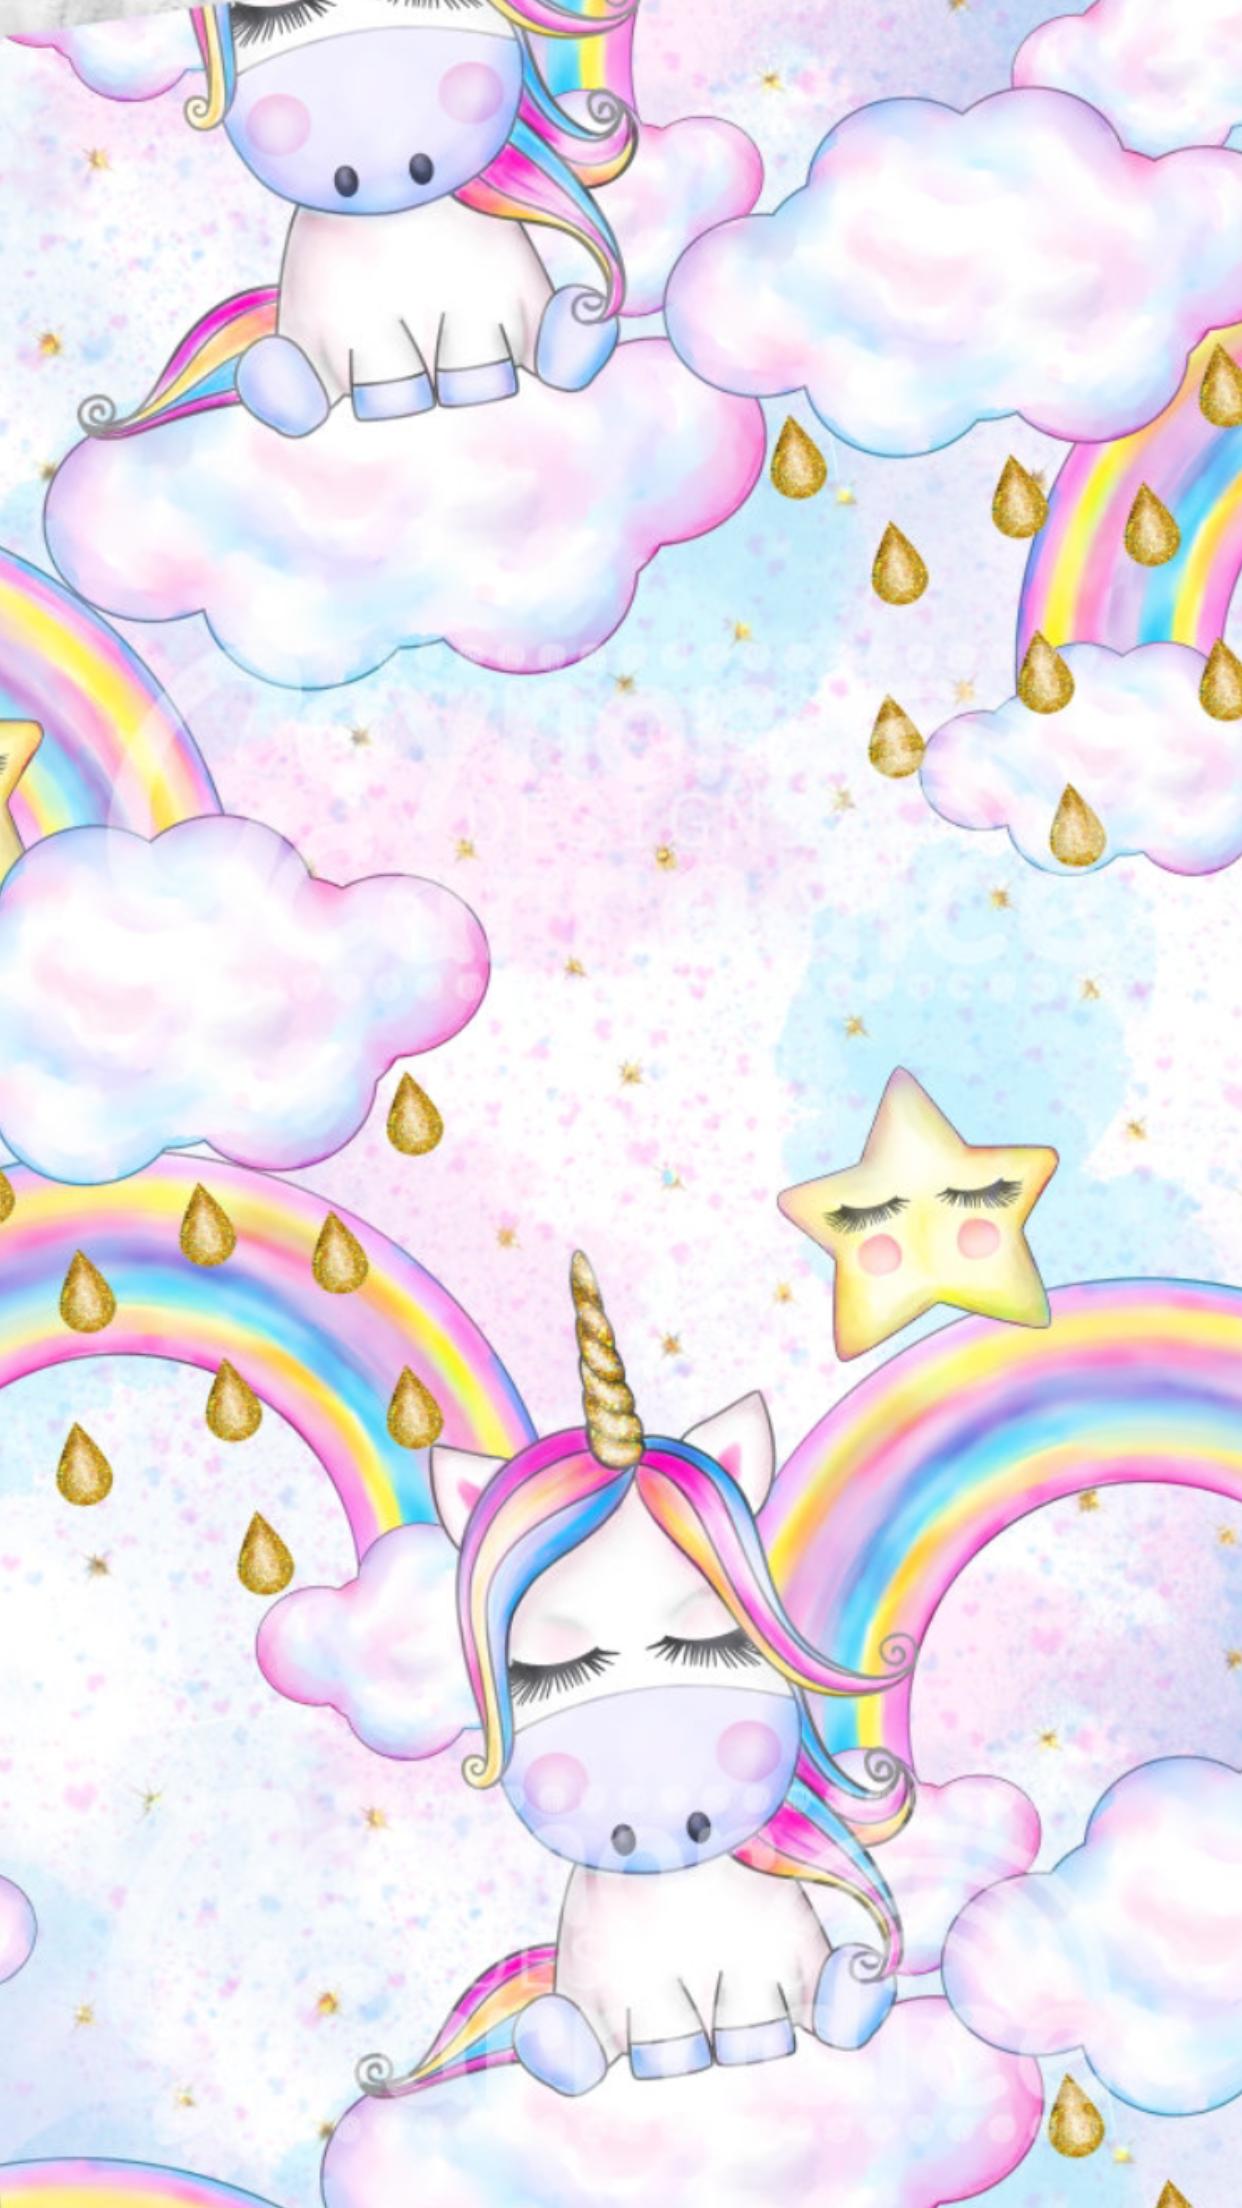 Unicorn And Rainbow Dengan Gambar Gambar Lucu